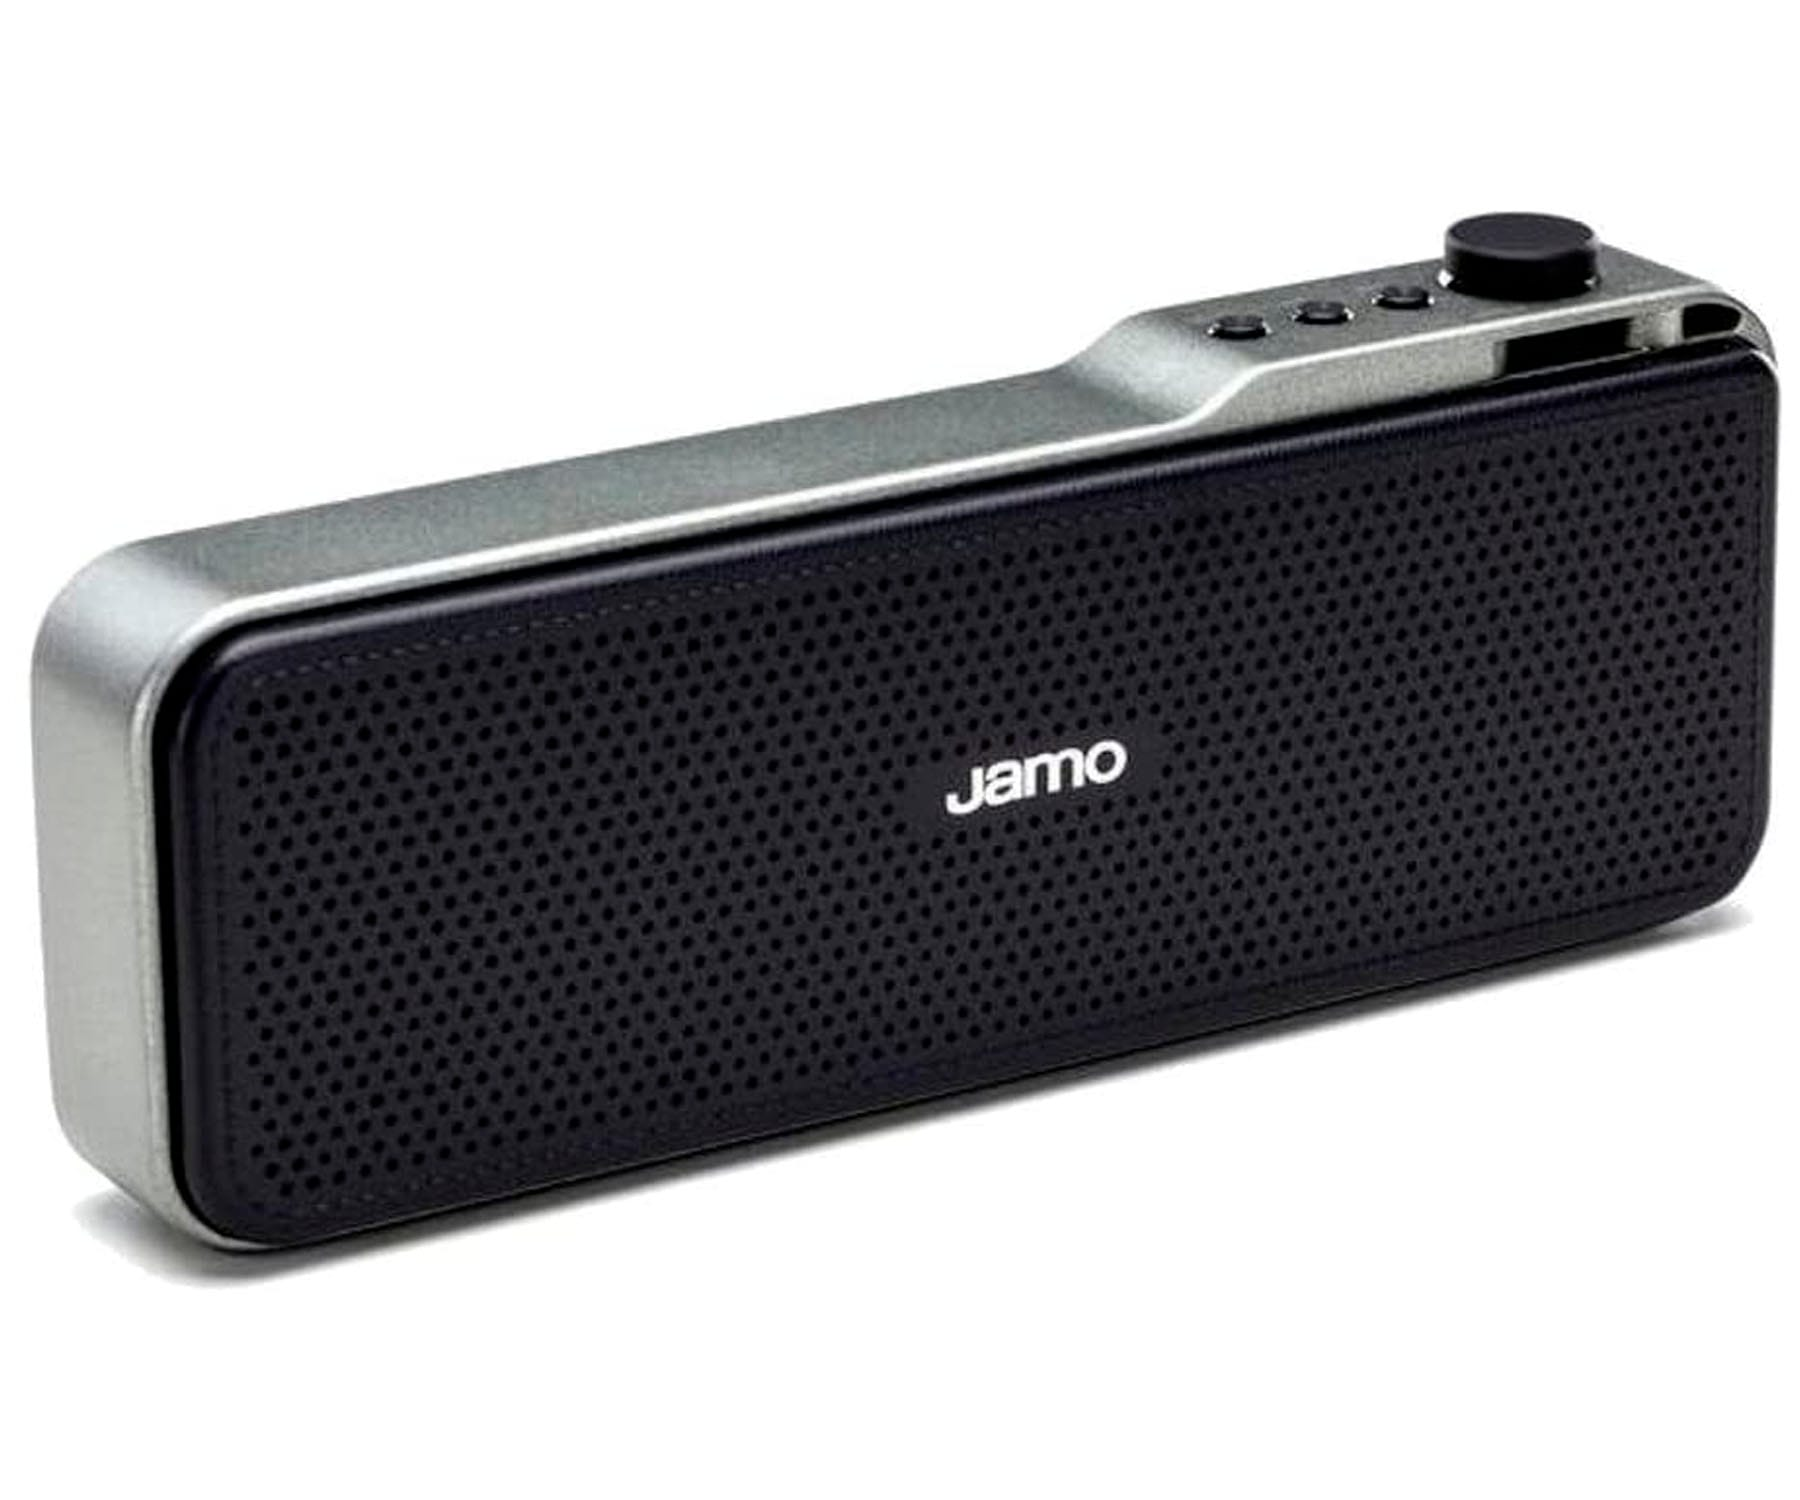 JAMO DS3 ALTAVOZ BLUETOOTH POTÁTIL GRAFITO 4.5W BATERÍA RECARGABLE SD FM AUX IN